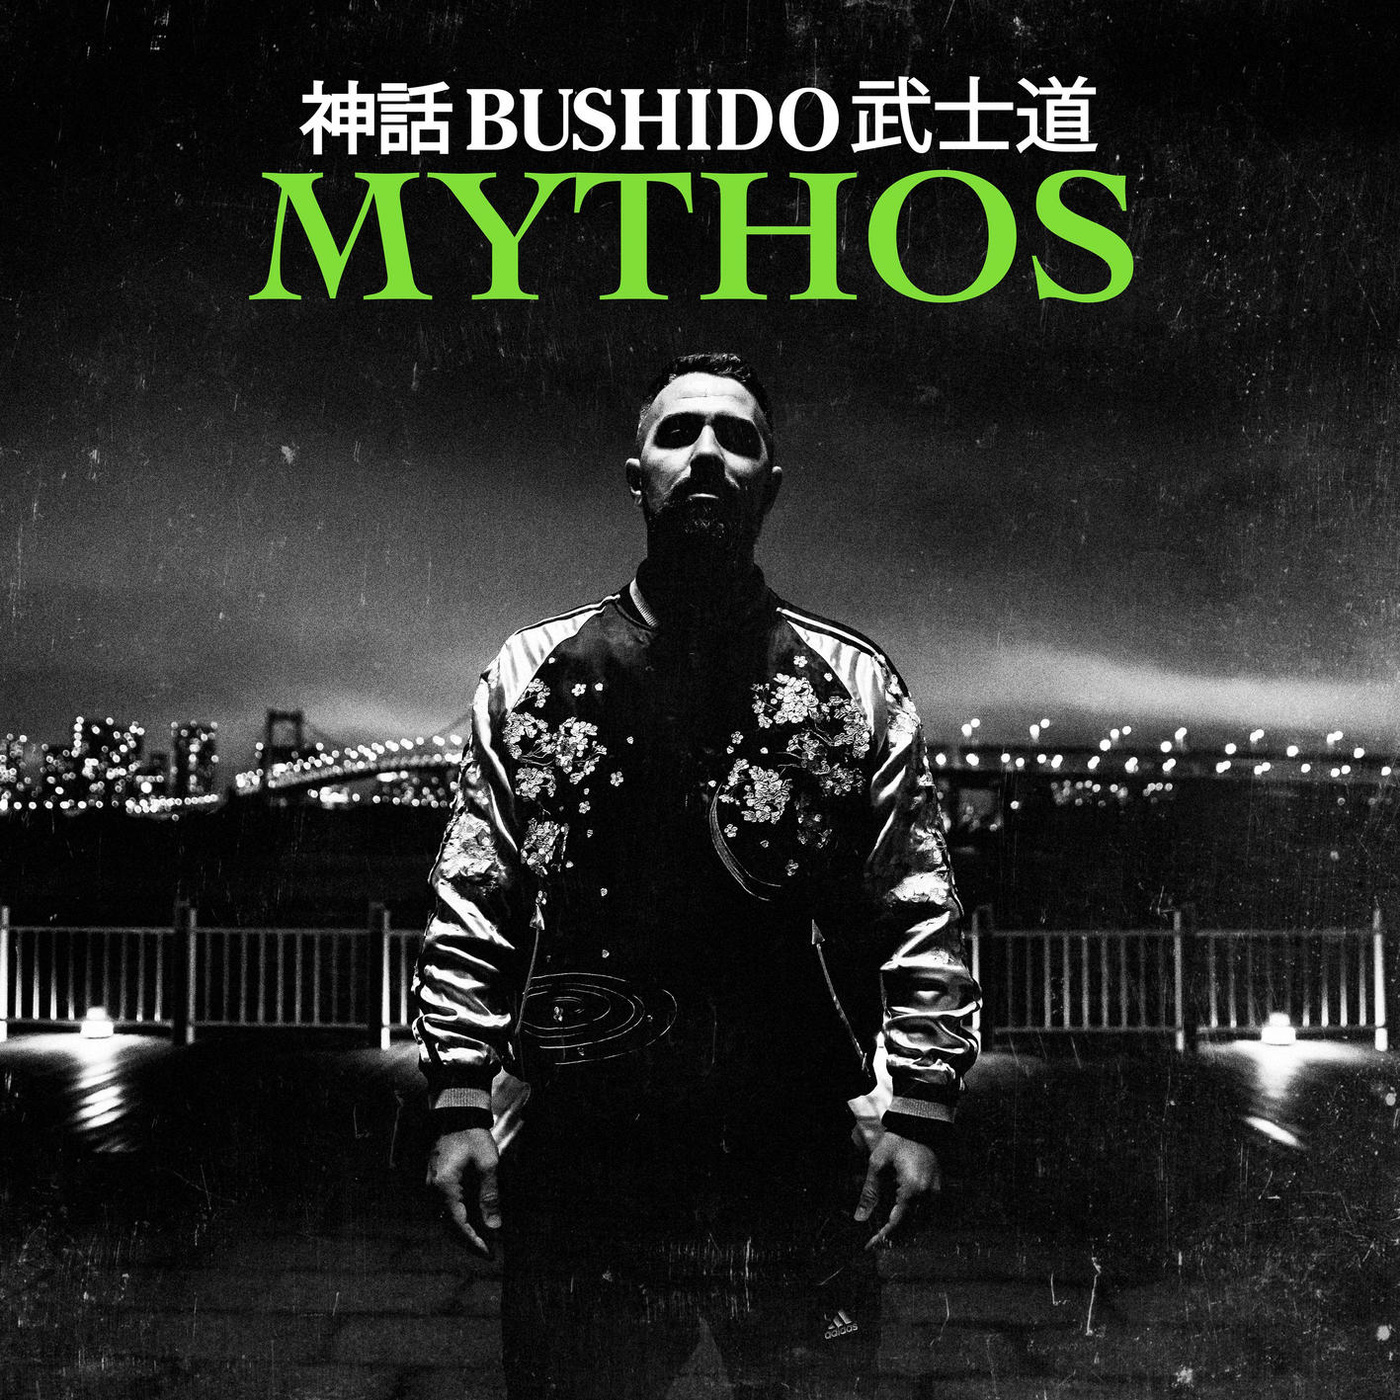 Bushido vendetta video downloaden.